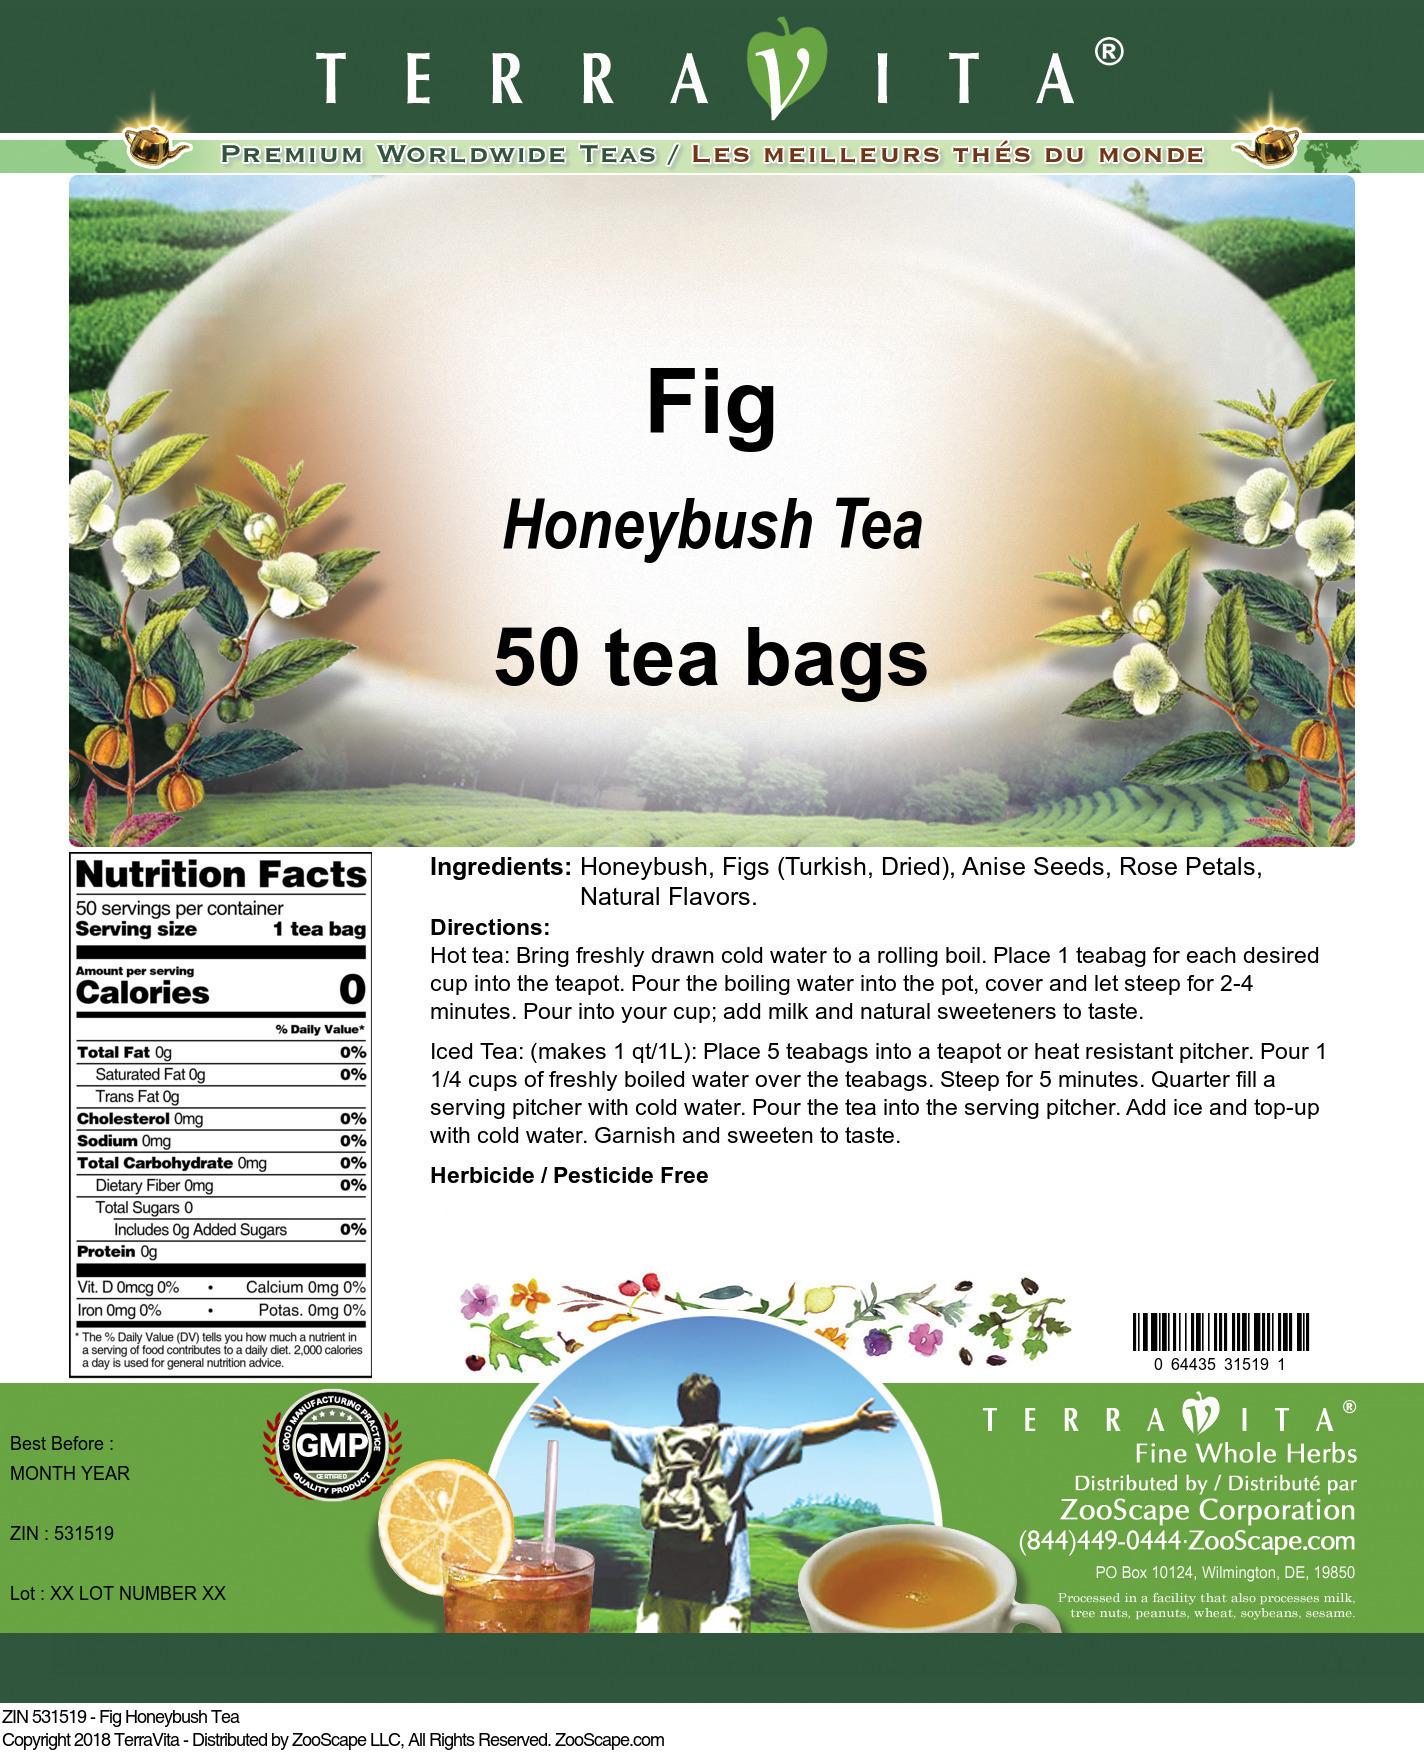 Fig Honeybush Tea